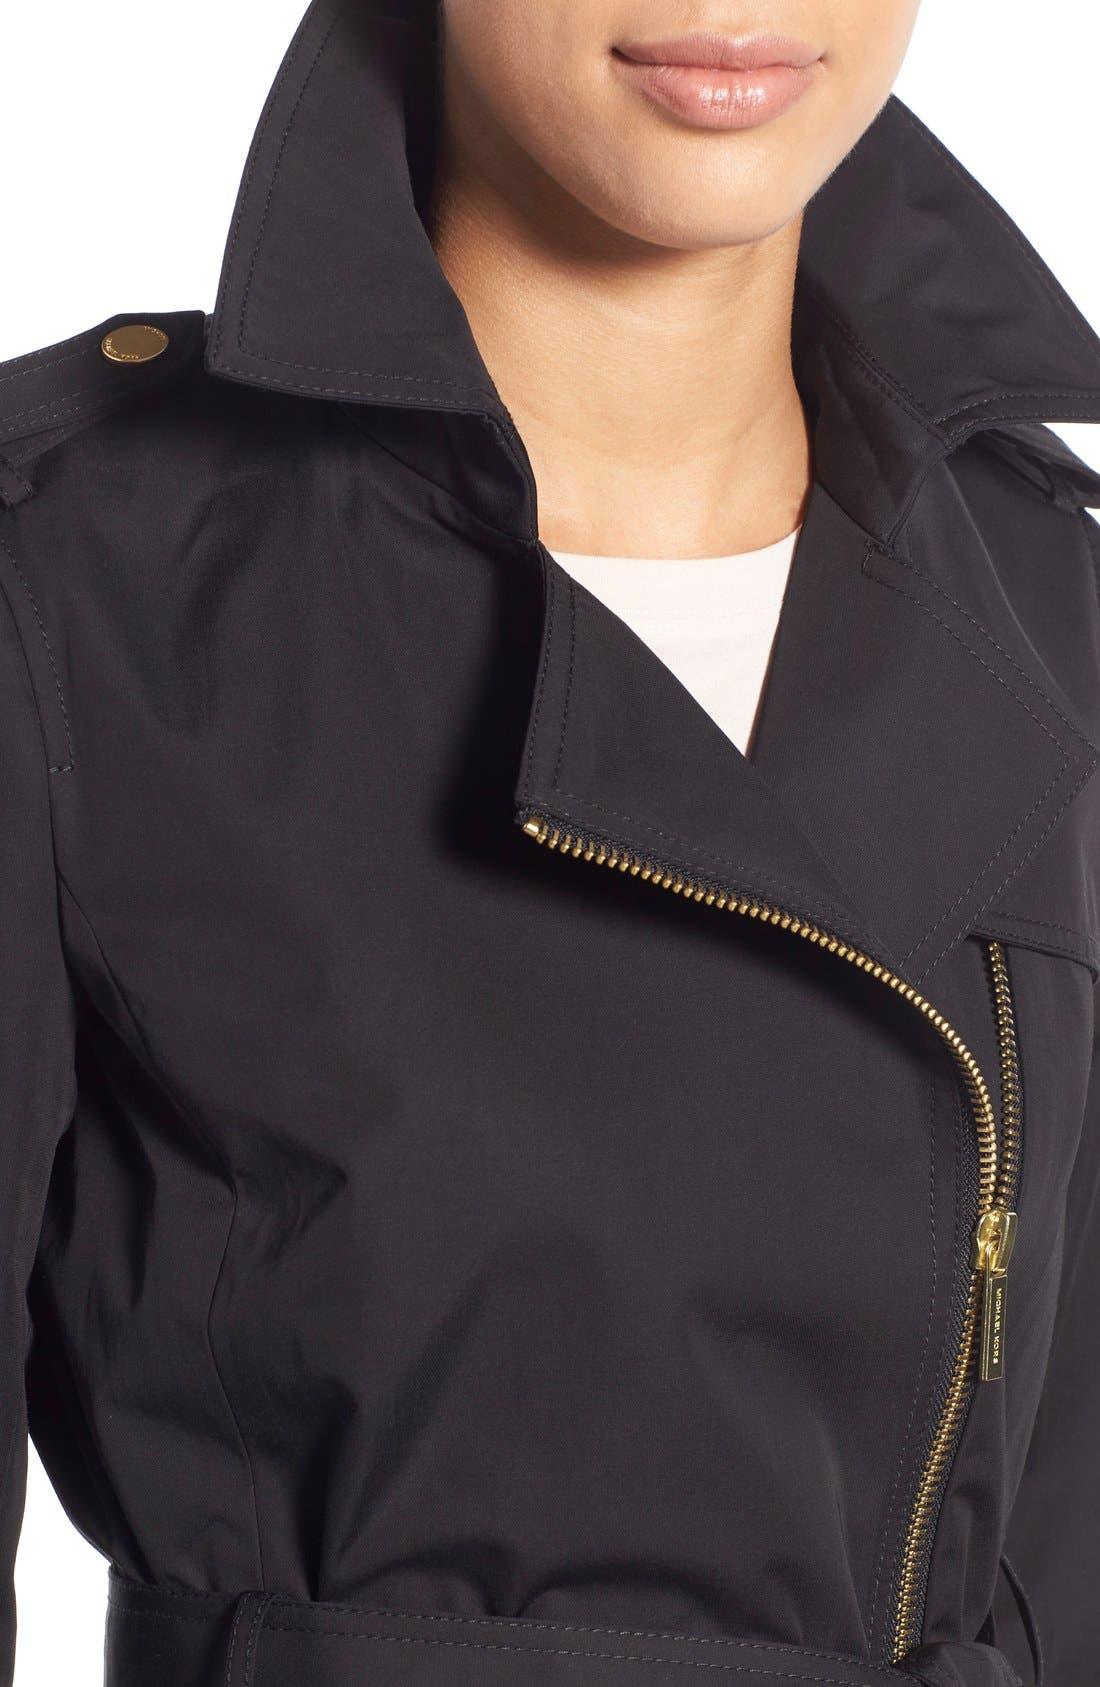 MICHAEL MICHAEL KORS,                             Asymmetrical Zip Sateen Trench Coat,                             Alternate thumbnail 3, color,                             001